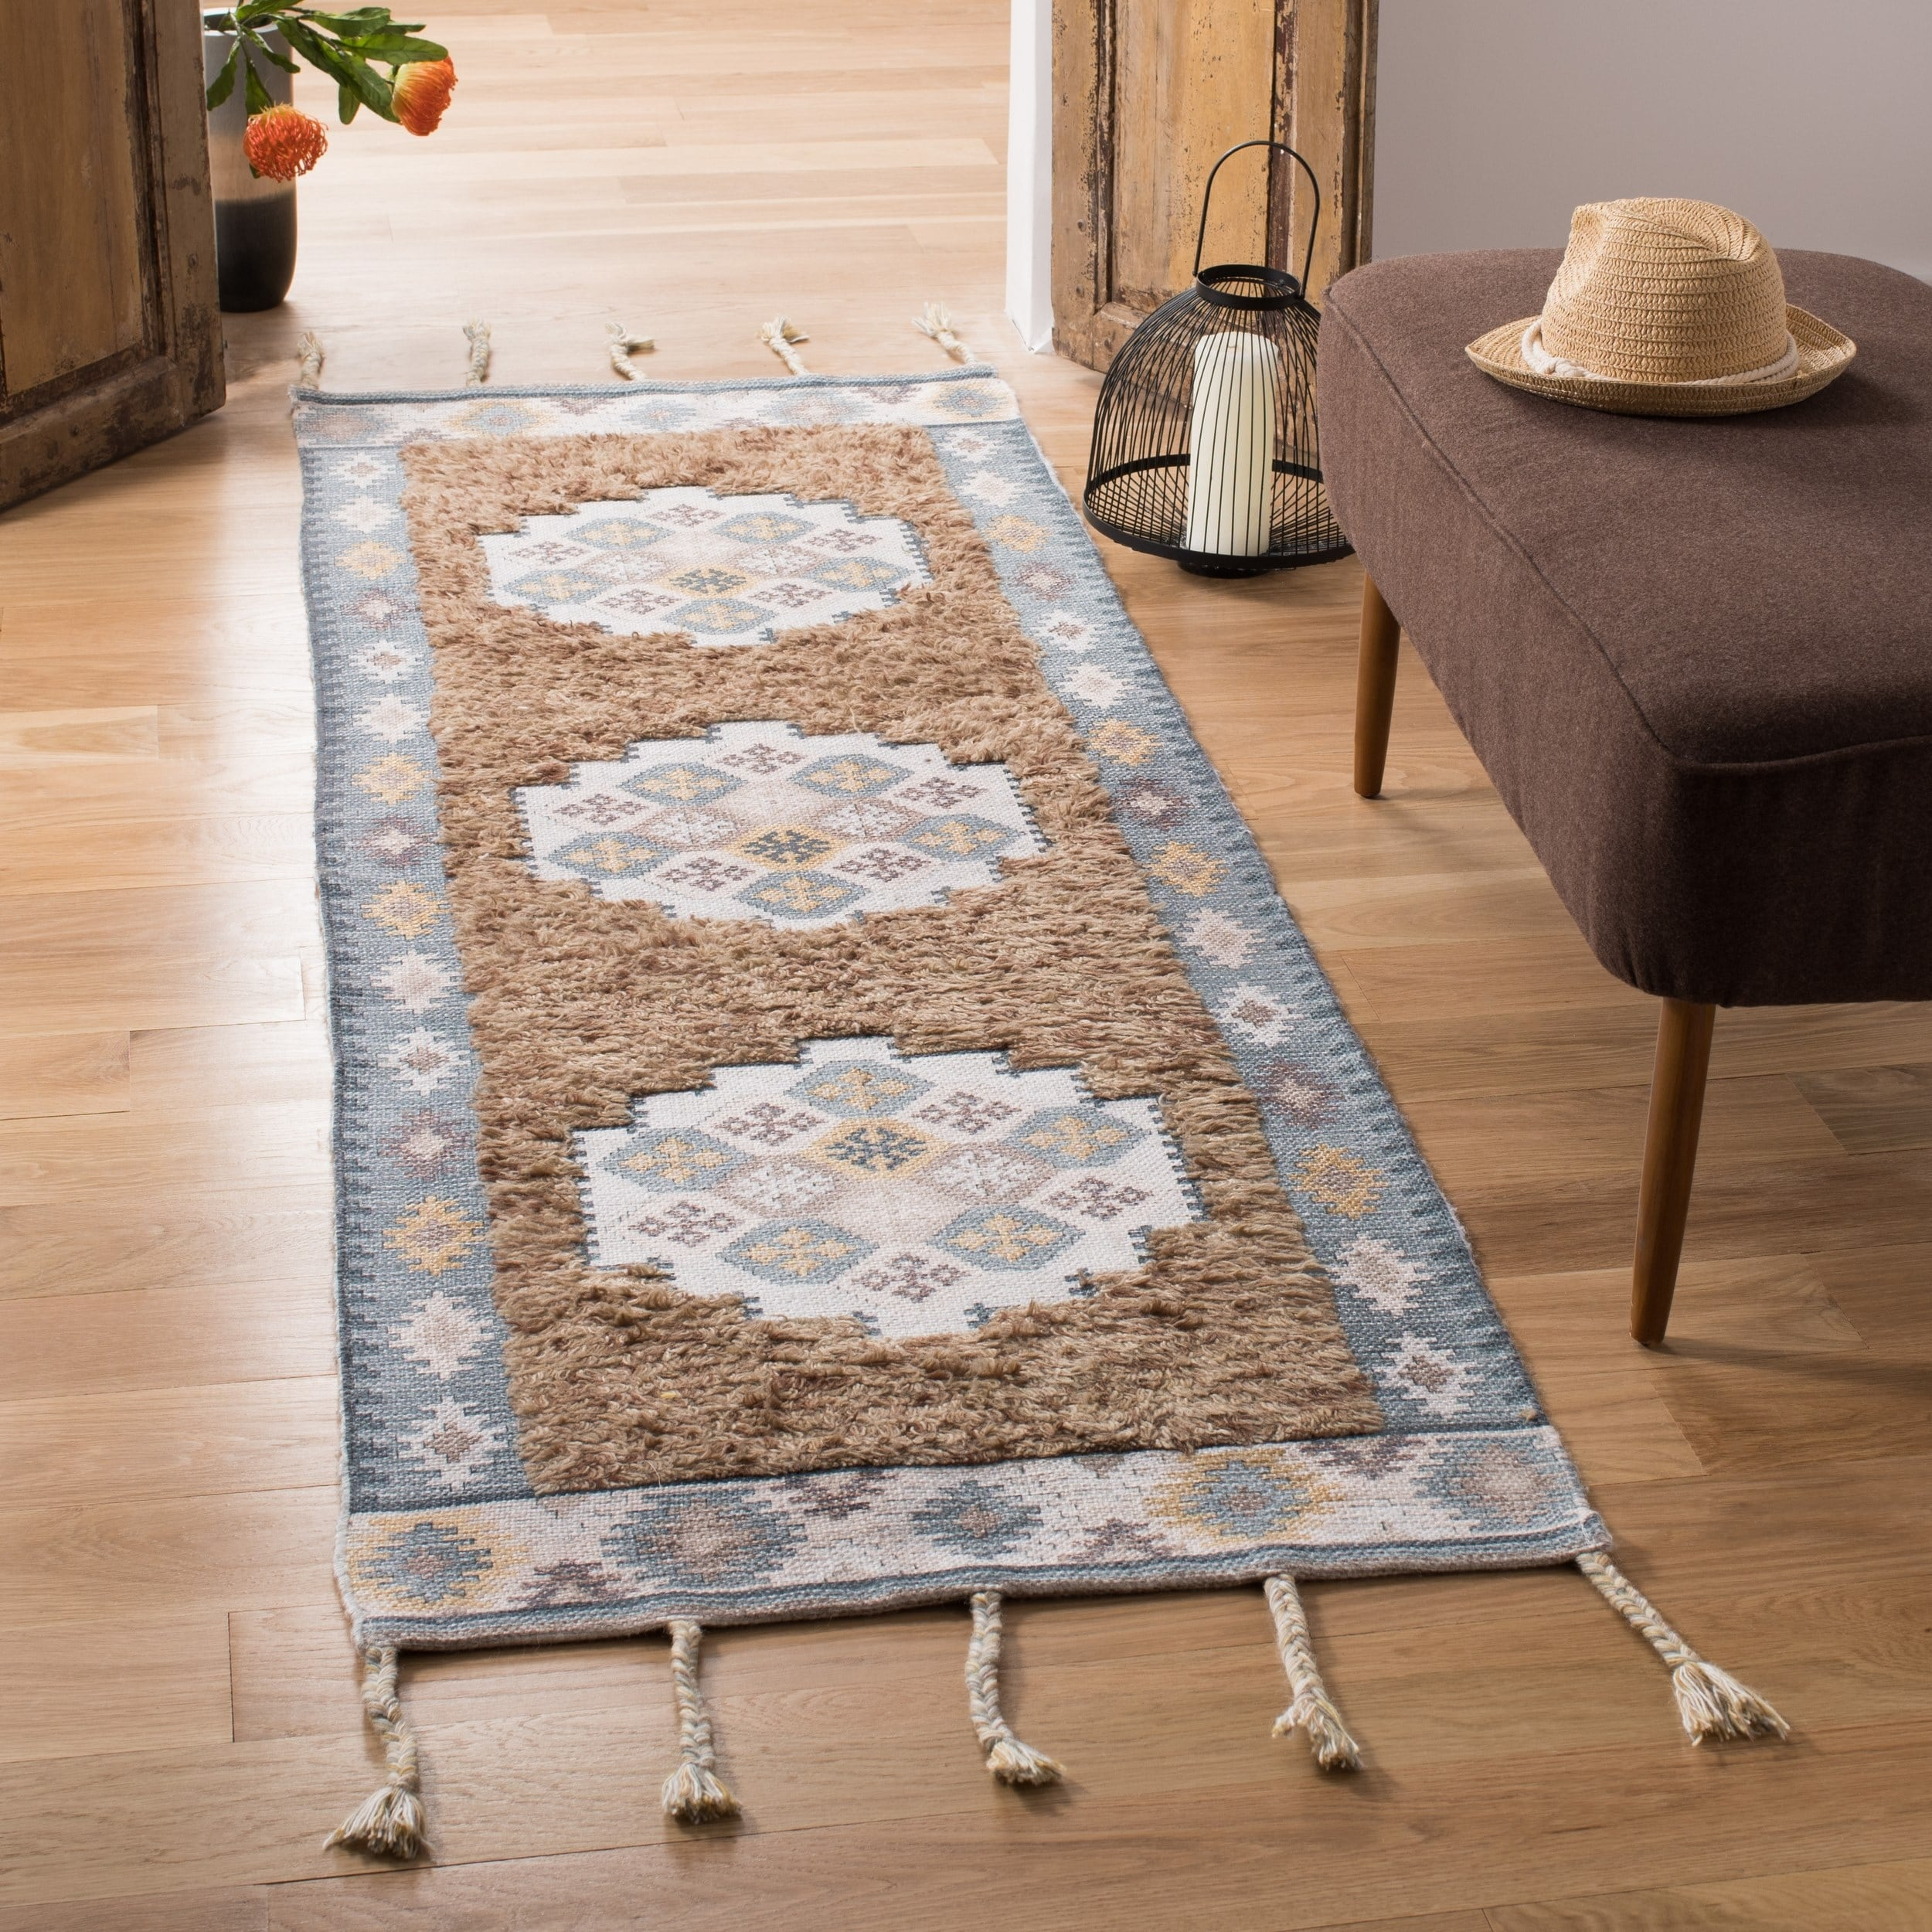 Safavieh Handmade Saffron Rajmonda Modern Tribal Cotton Rug Overstock 26287304